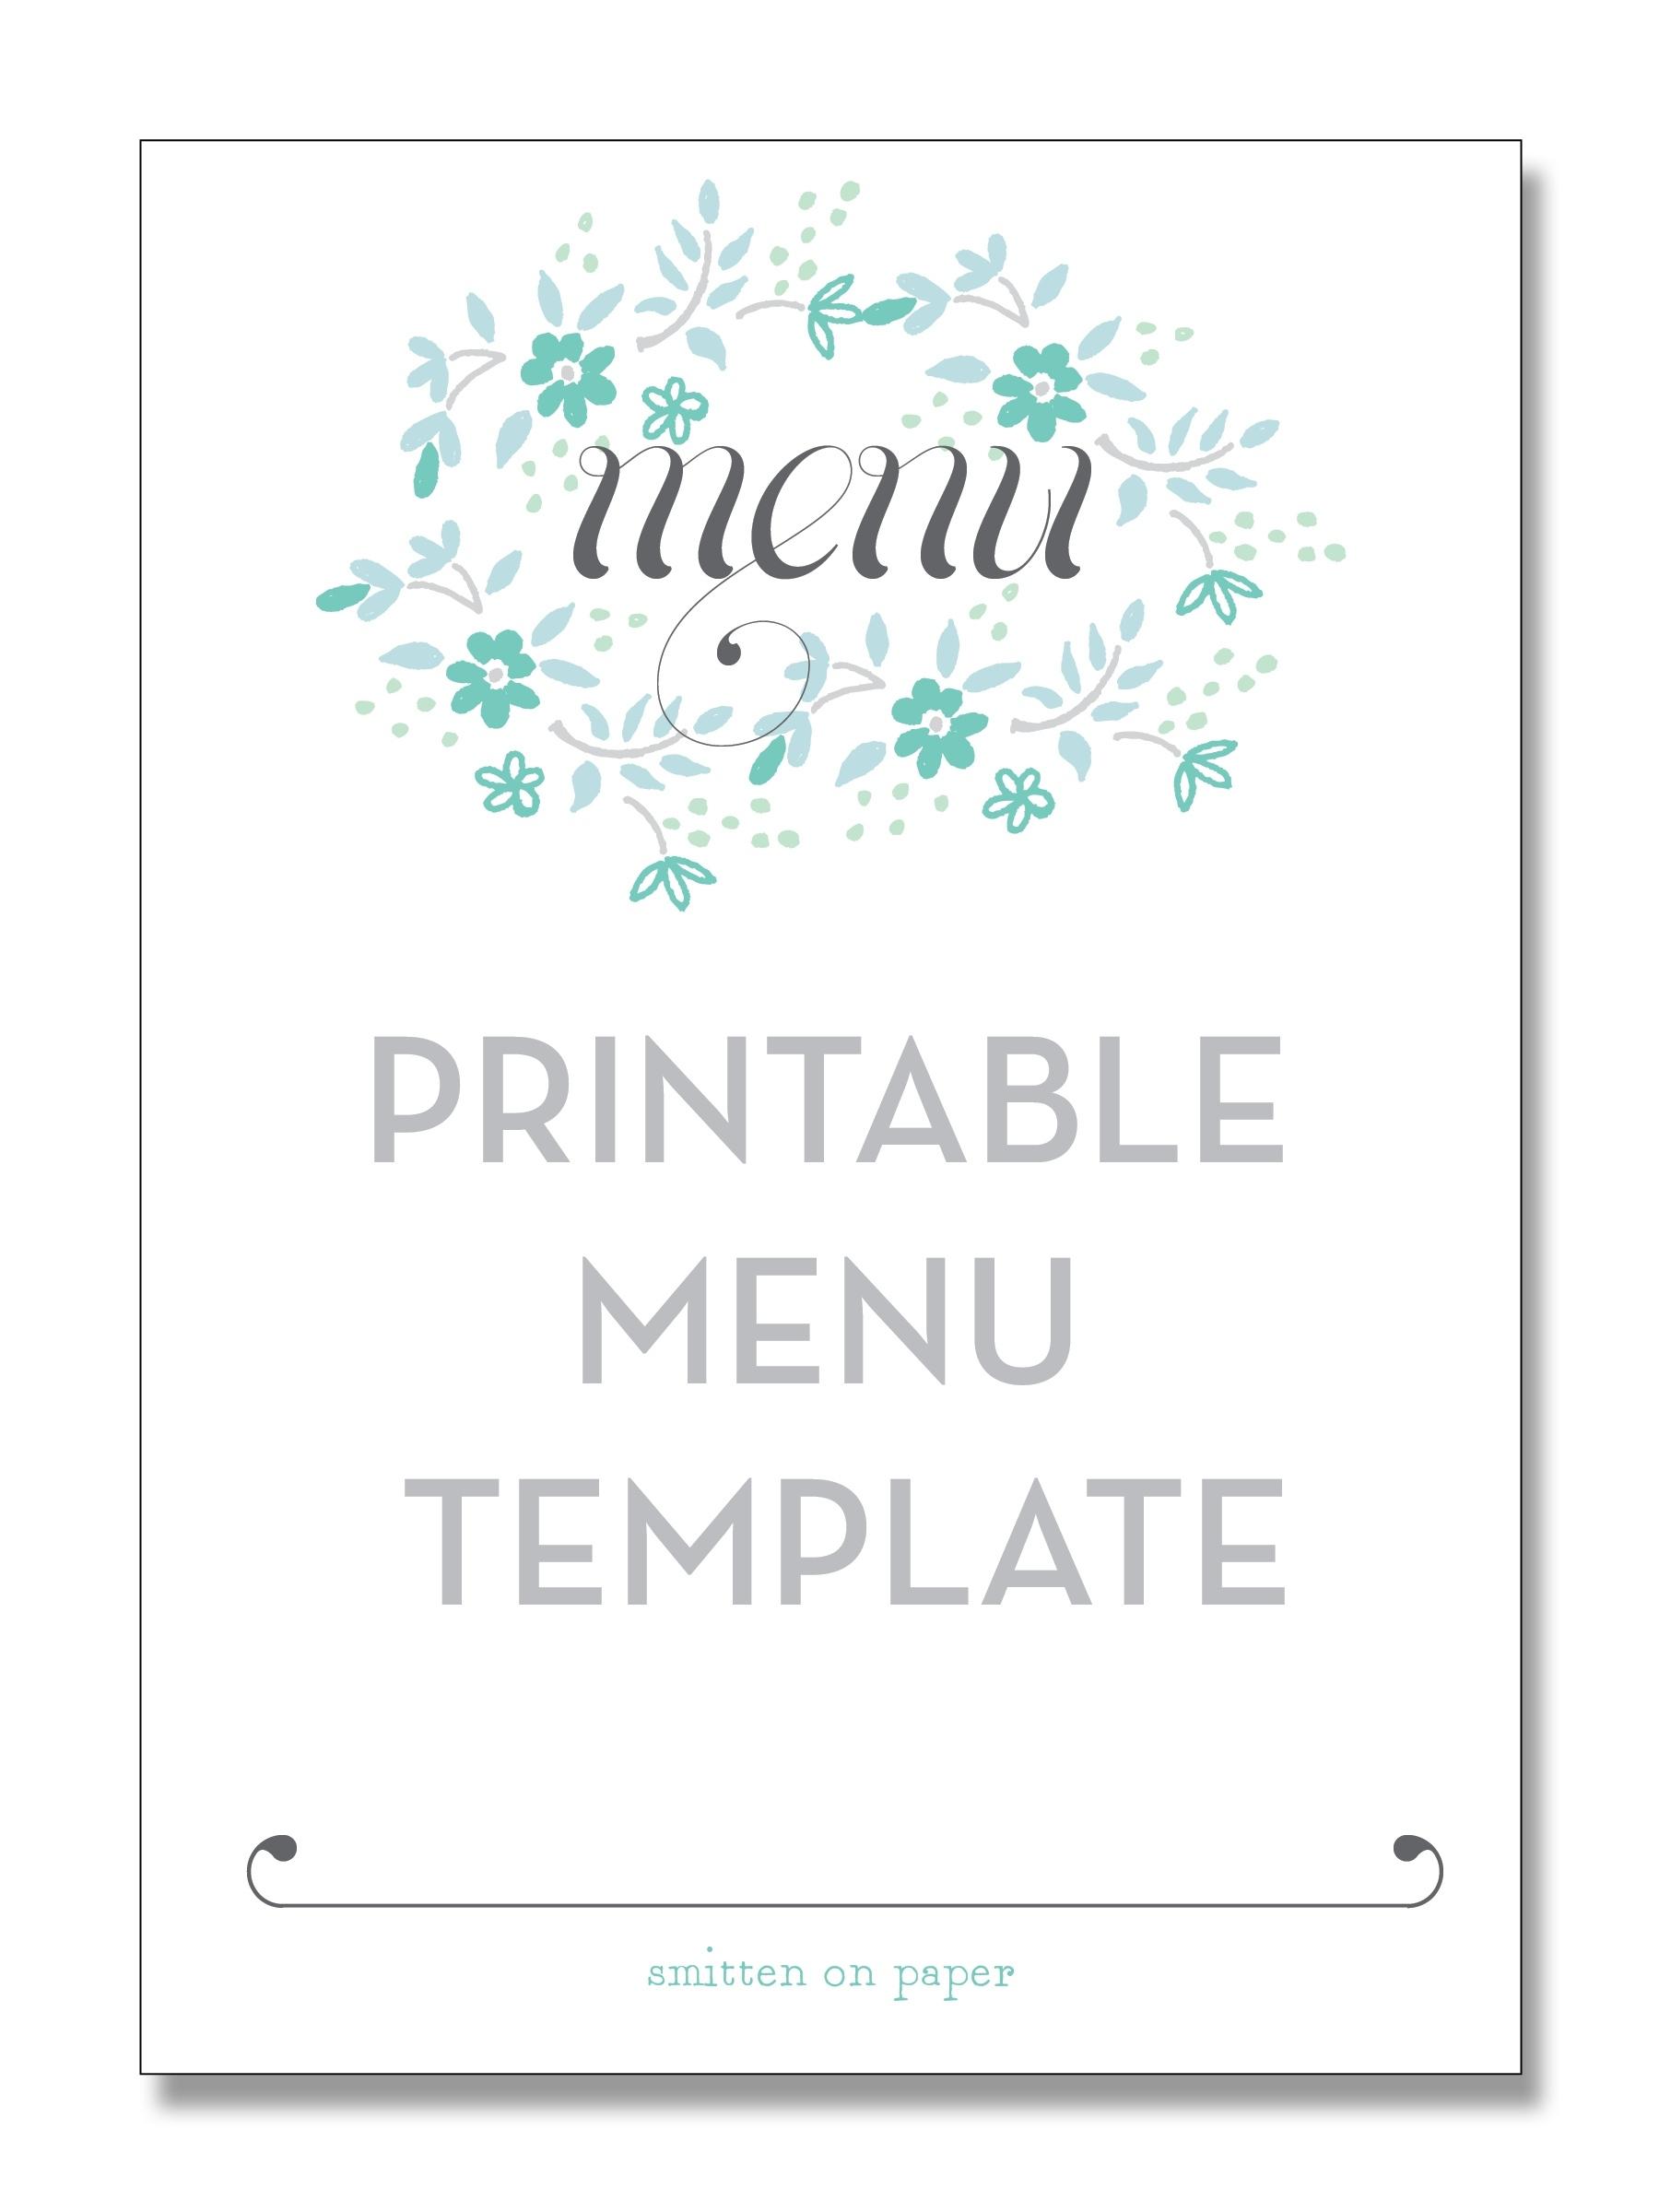 Free Printable Blank Menu Templates With Restaurant  Menus Pics - Free Printable Menu Maker